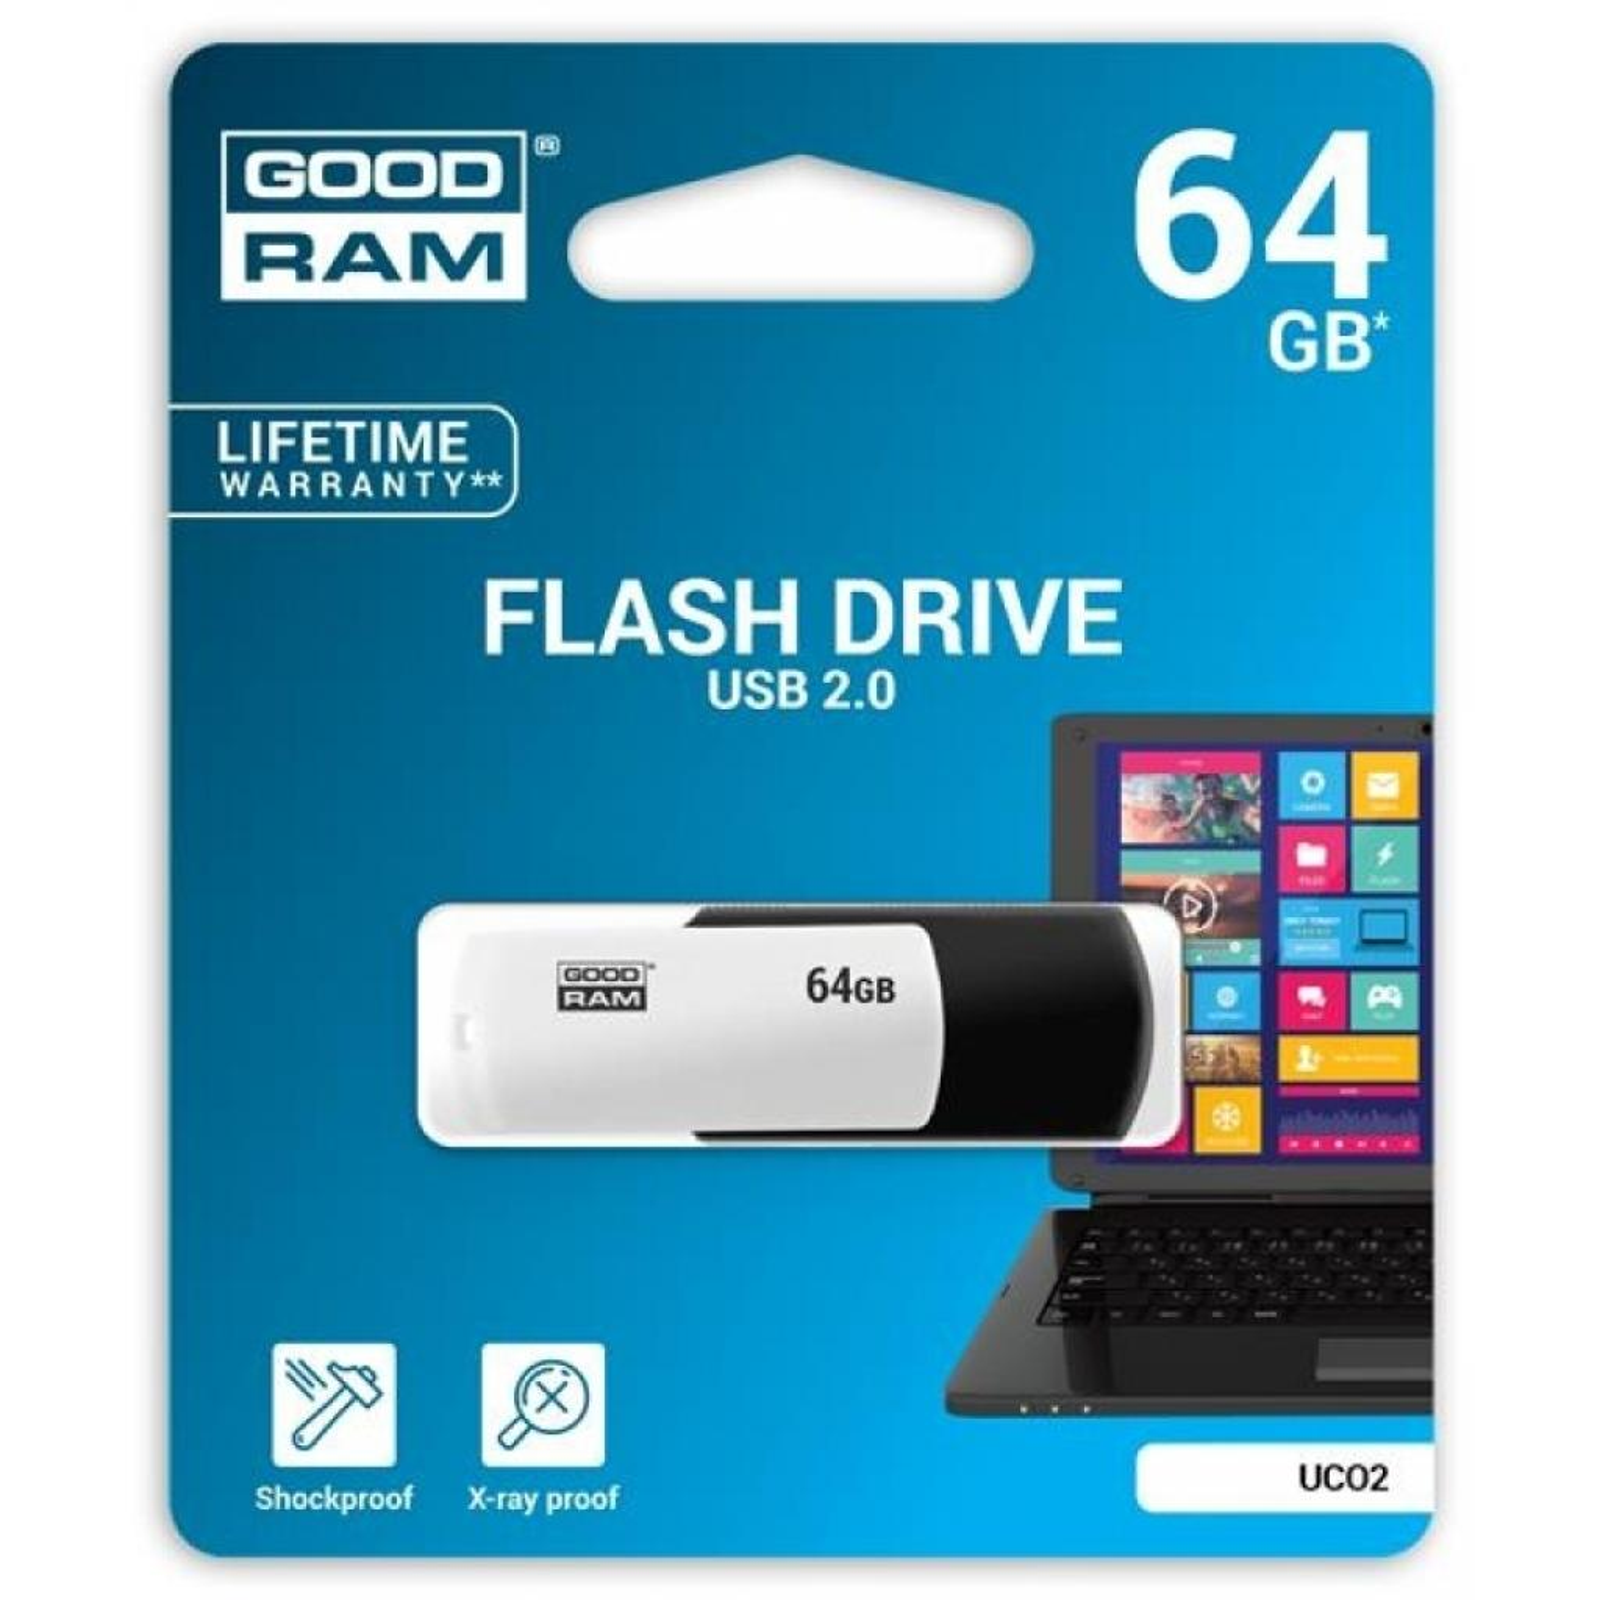 USB флеш накопитель Goodram 16GB UCO2 (Colour Mix) Black/White USB 2.0 (UCO2-0160KWR11) изображение 3